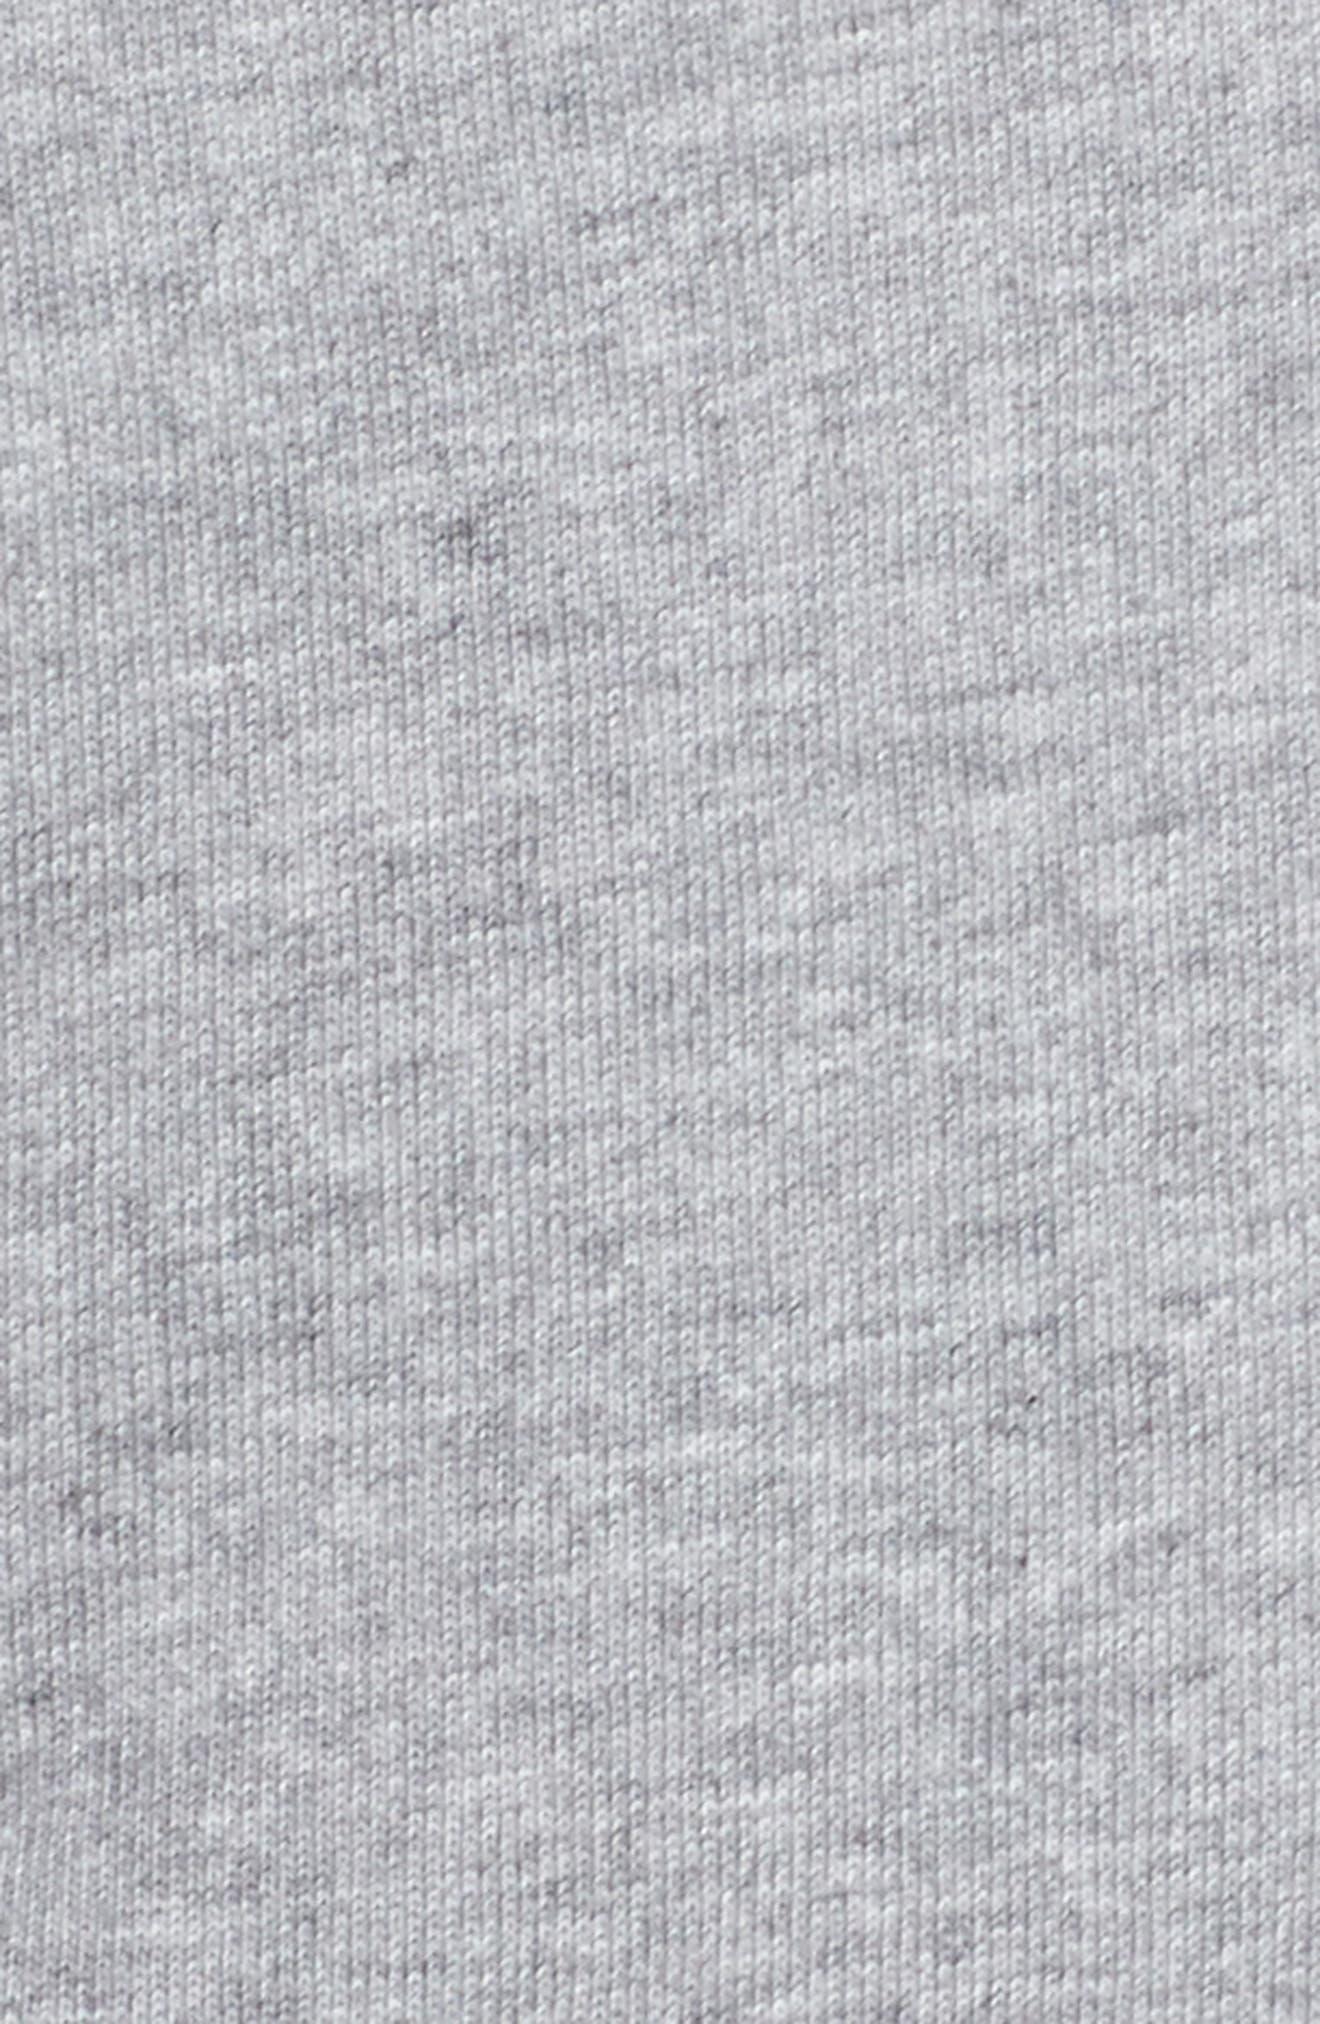 Chalet Fleece Lined Hooded Wrap,                             Alternate thumbnail 7, color,                             030